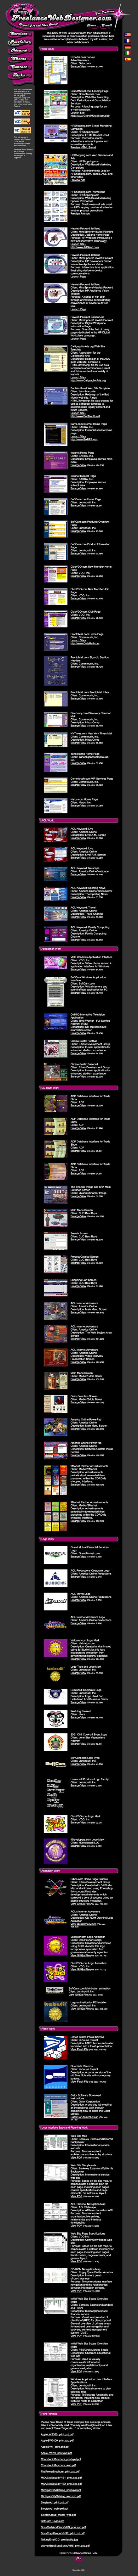 freelance-web-designer-portfolio-page